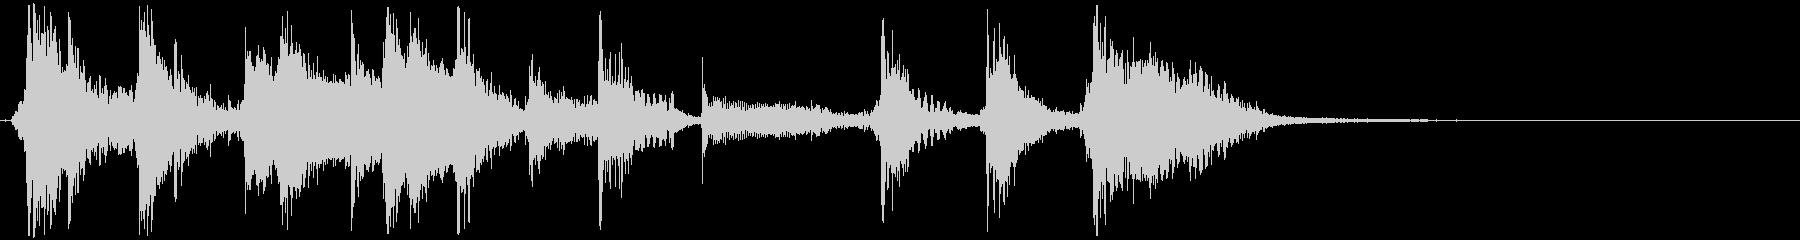 slapBassのファンキージングル2の未再生の波形